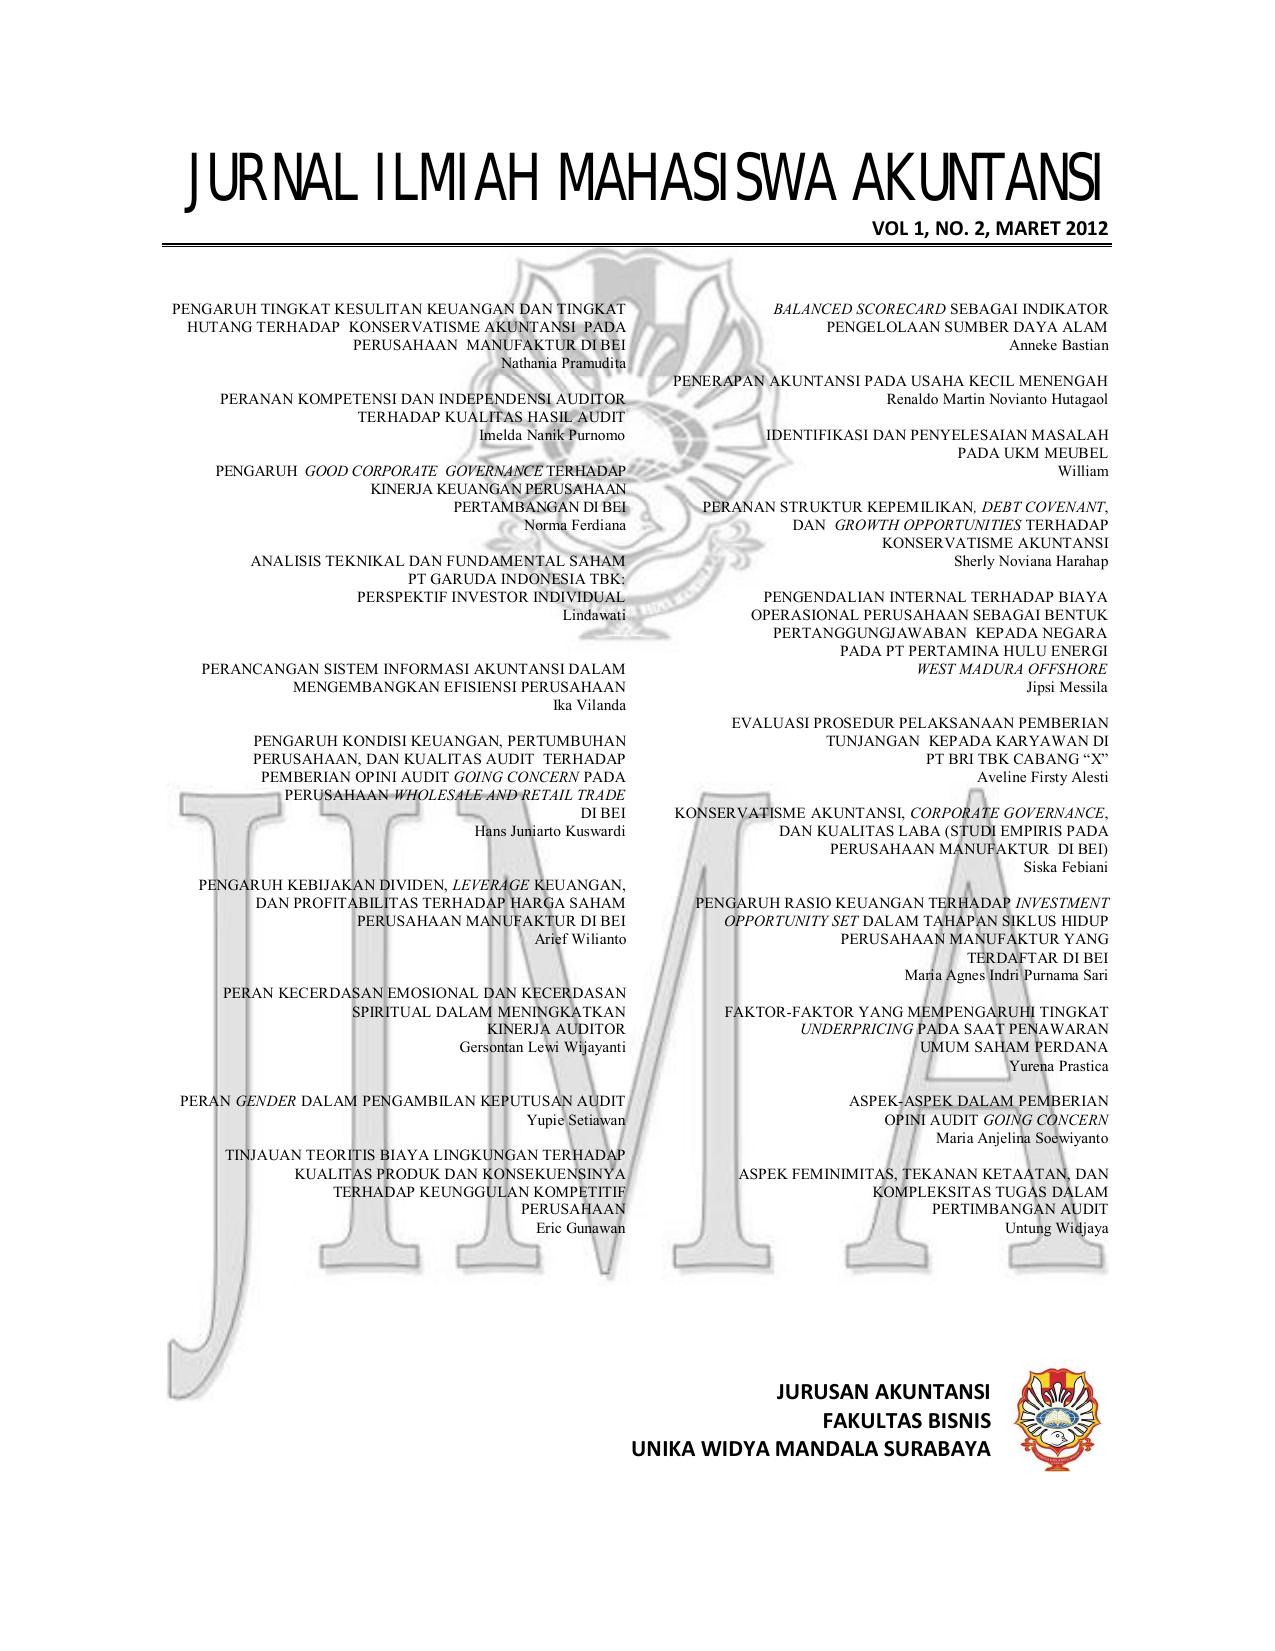 Jurnal ilmiah mahasiswa akuntansi 0011969761 553c92281b3208417ff39d7686153cebg ccuart Image collections